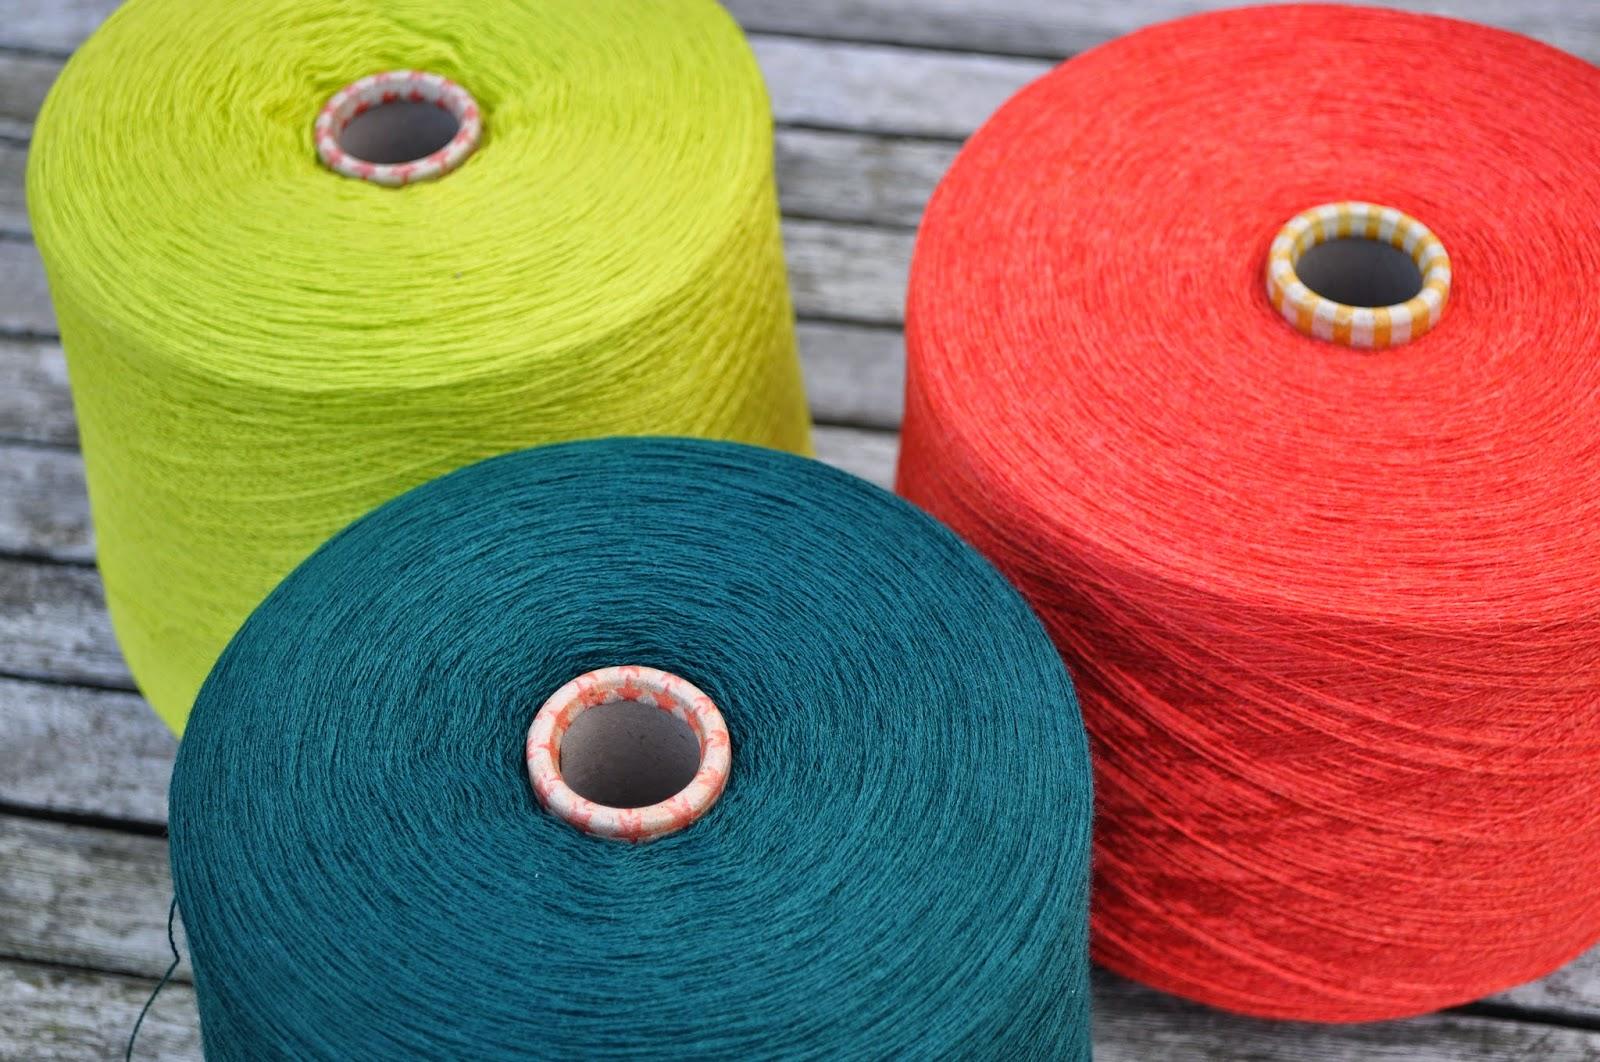 Nye lækre farver i det superfine Merino strikkegarn Amigo.